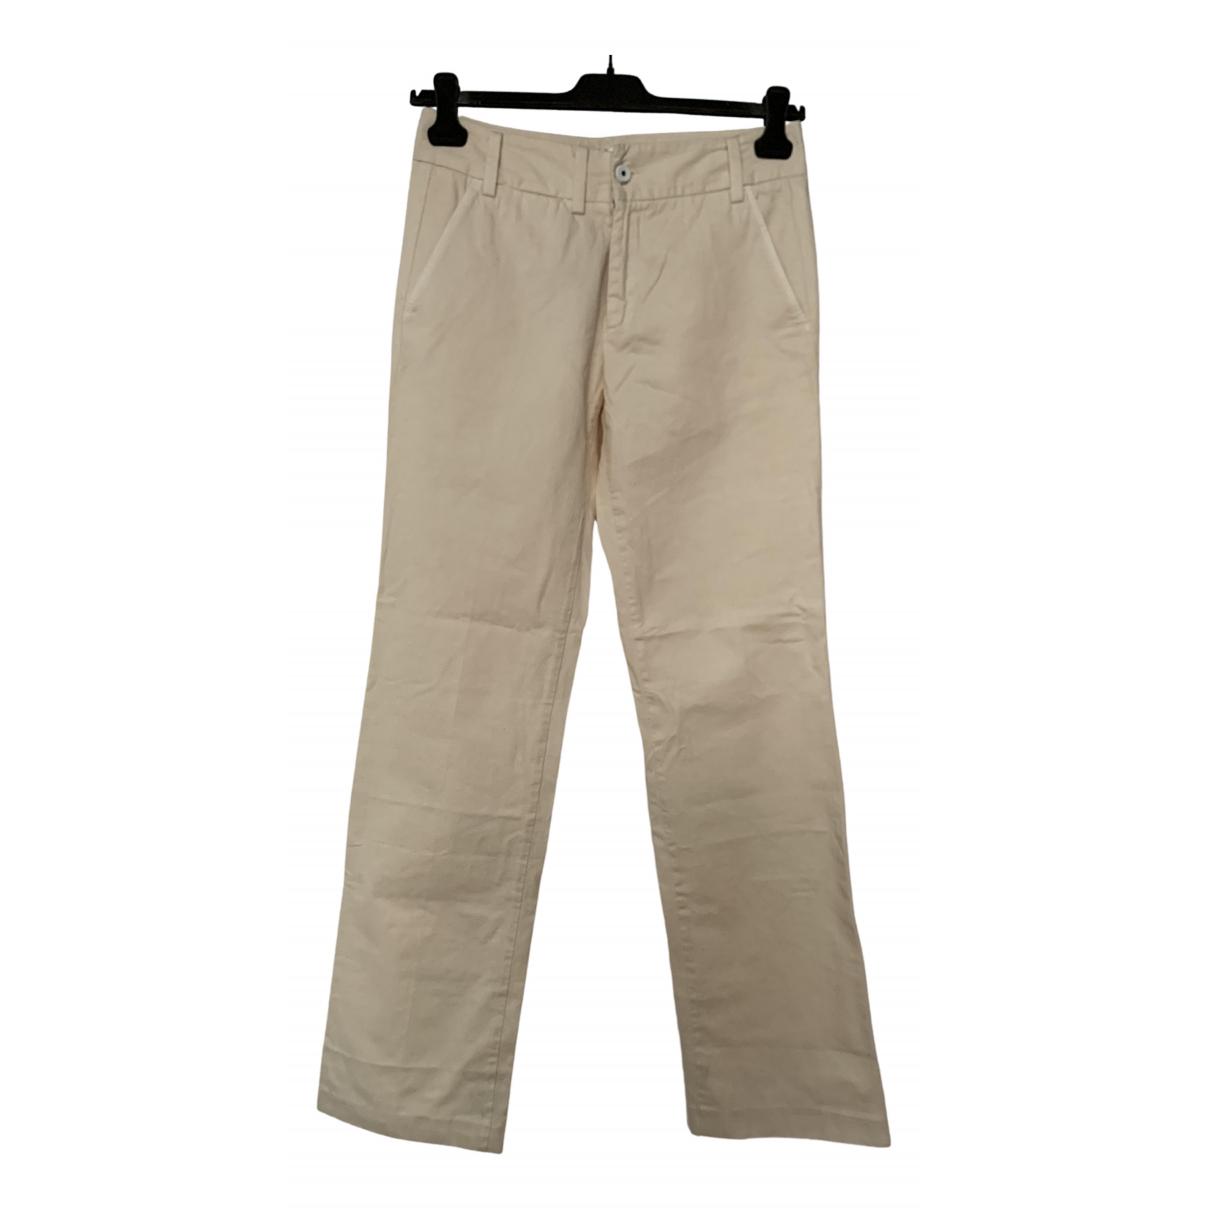 Diesel \N White Cotton Trousers for Men 28 UK - US